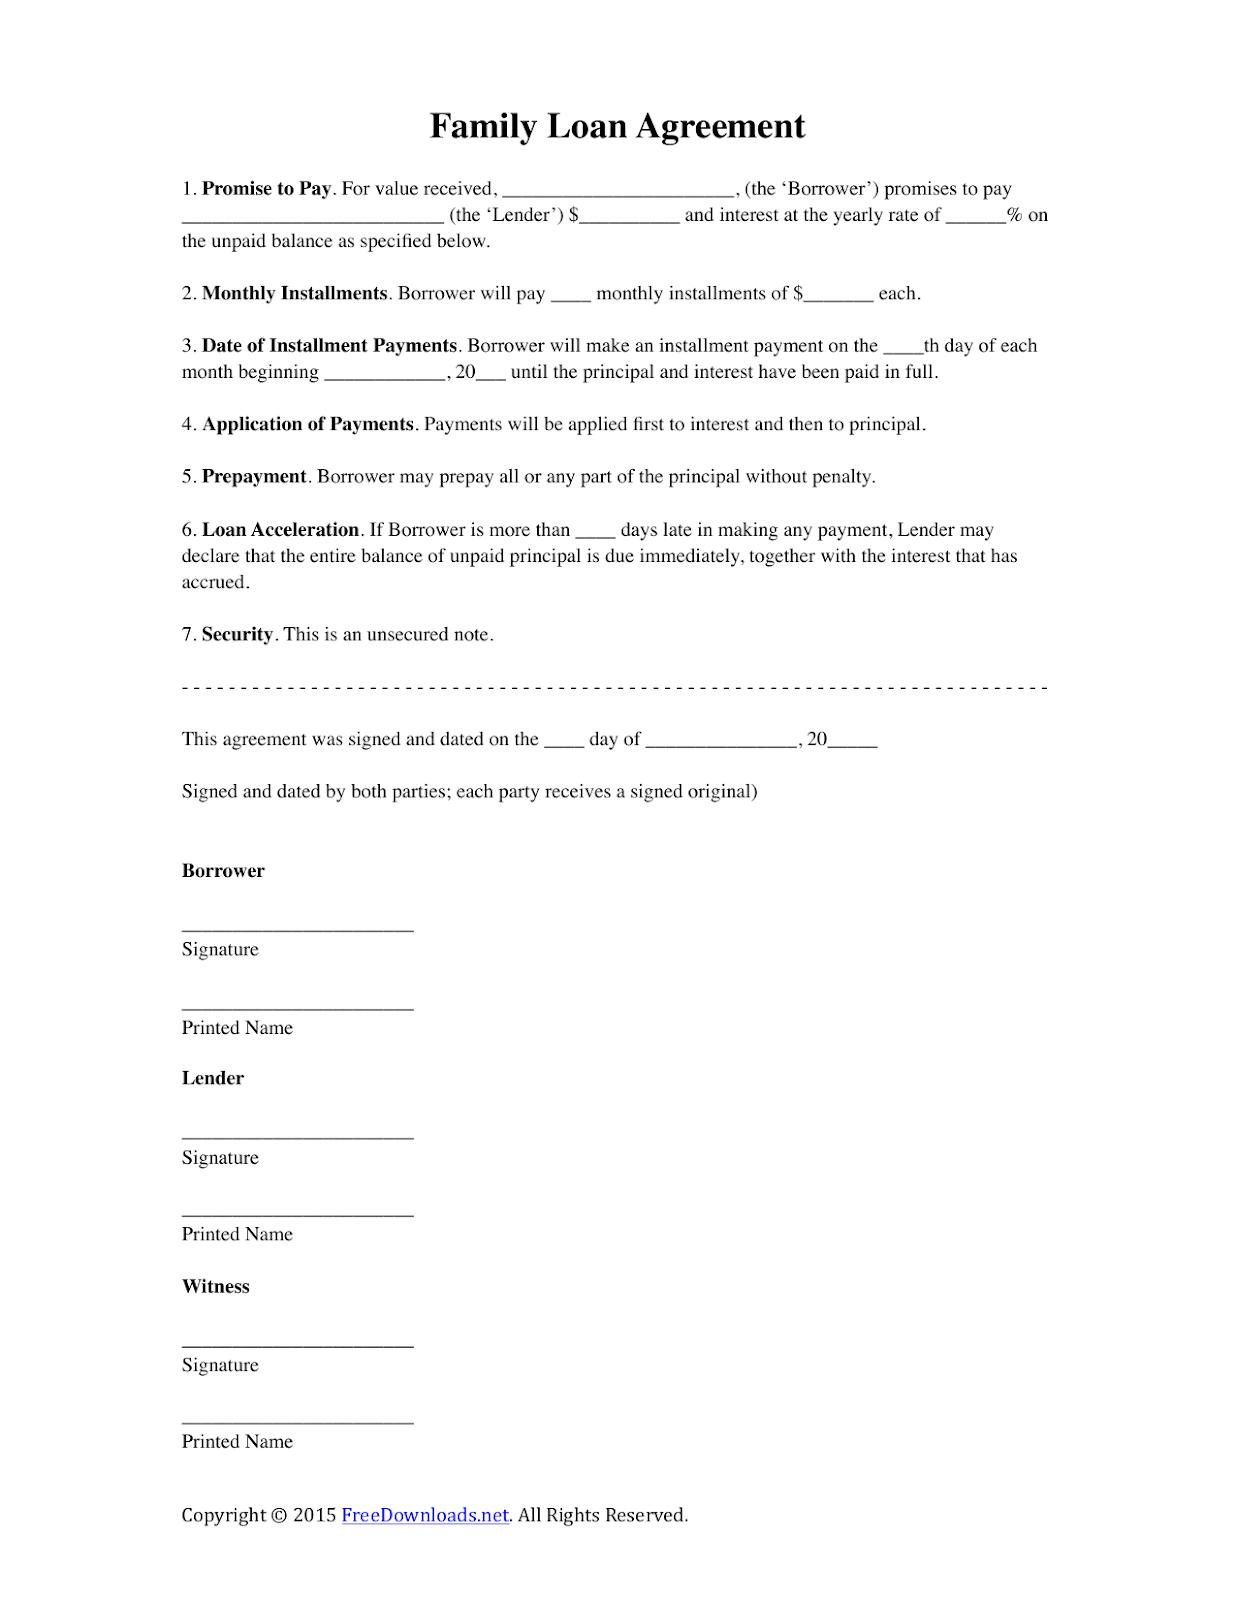 Family Loan Agreement Template Free   Huuti